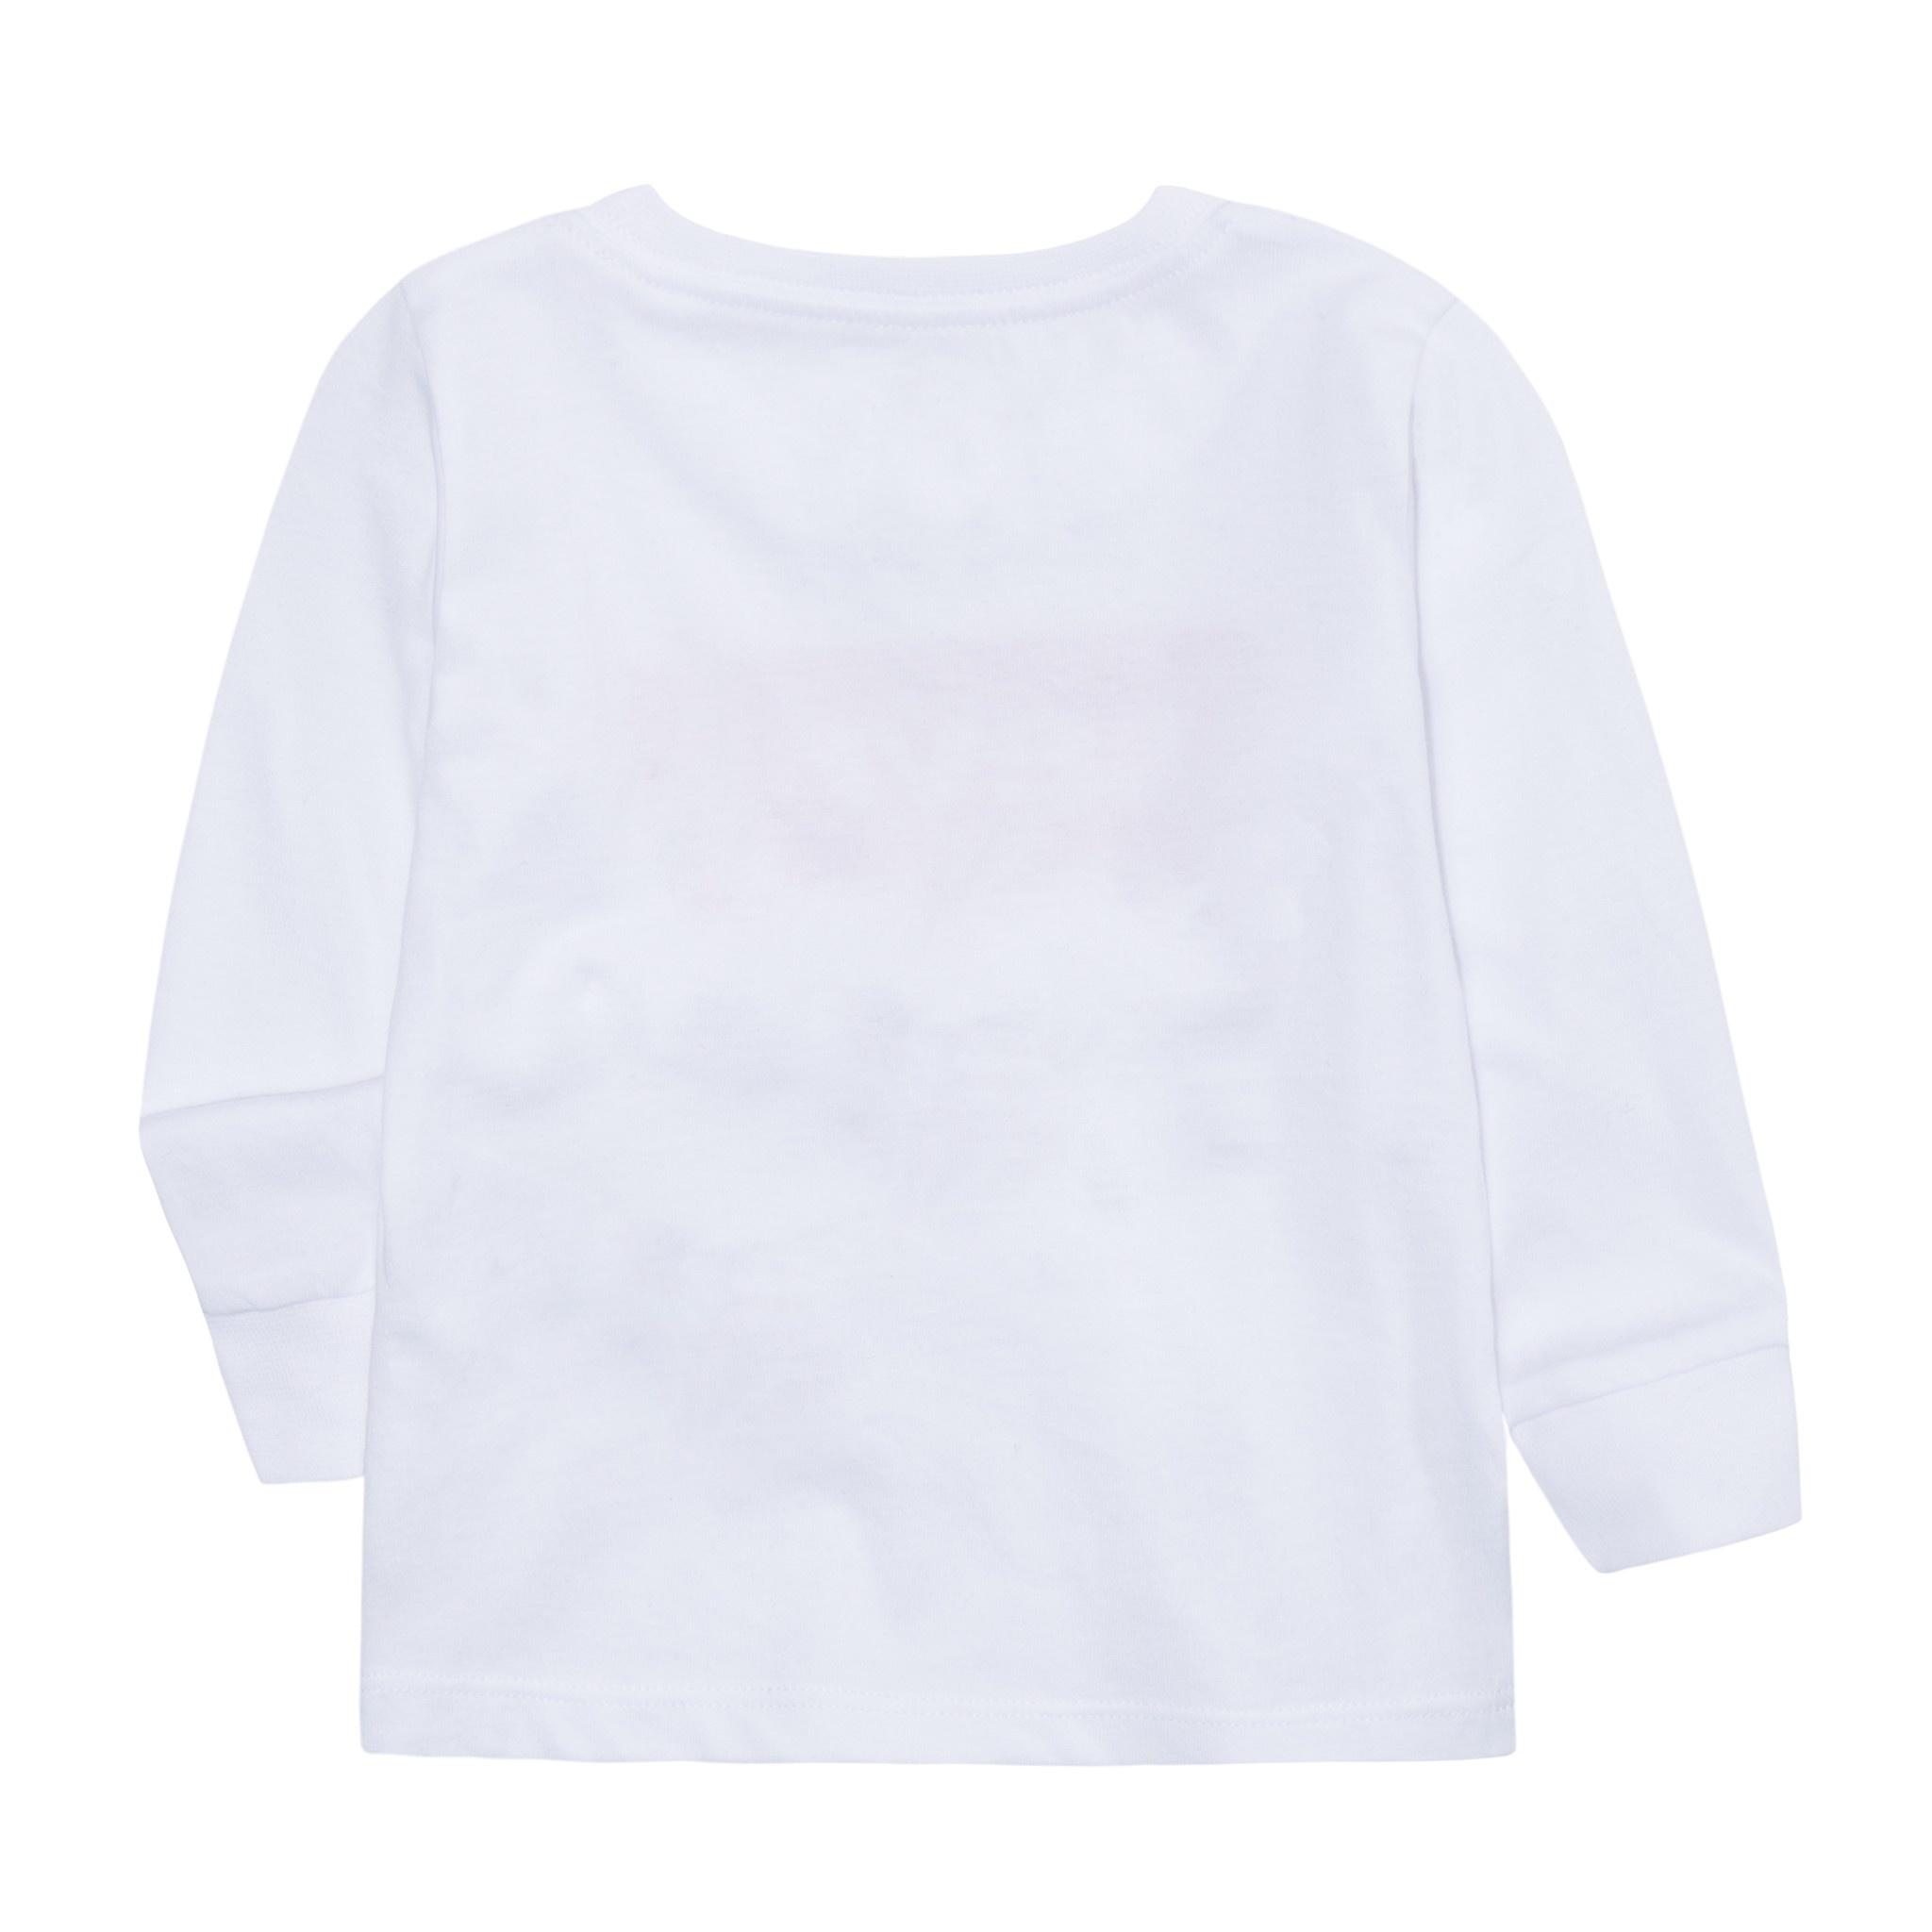 Levi's T-shirt longsleeve batwing white